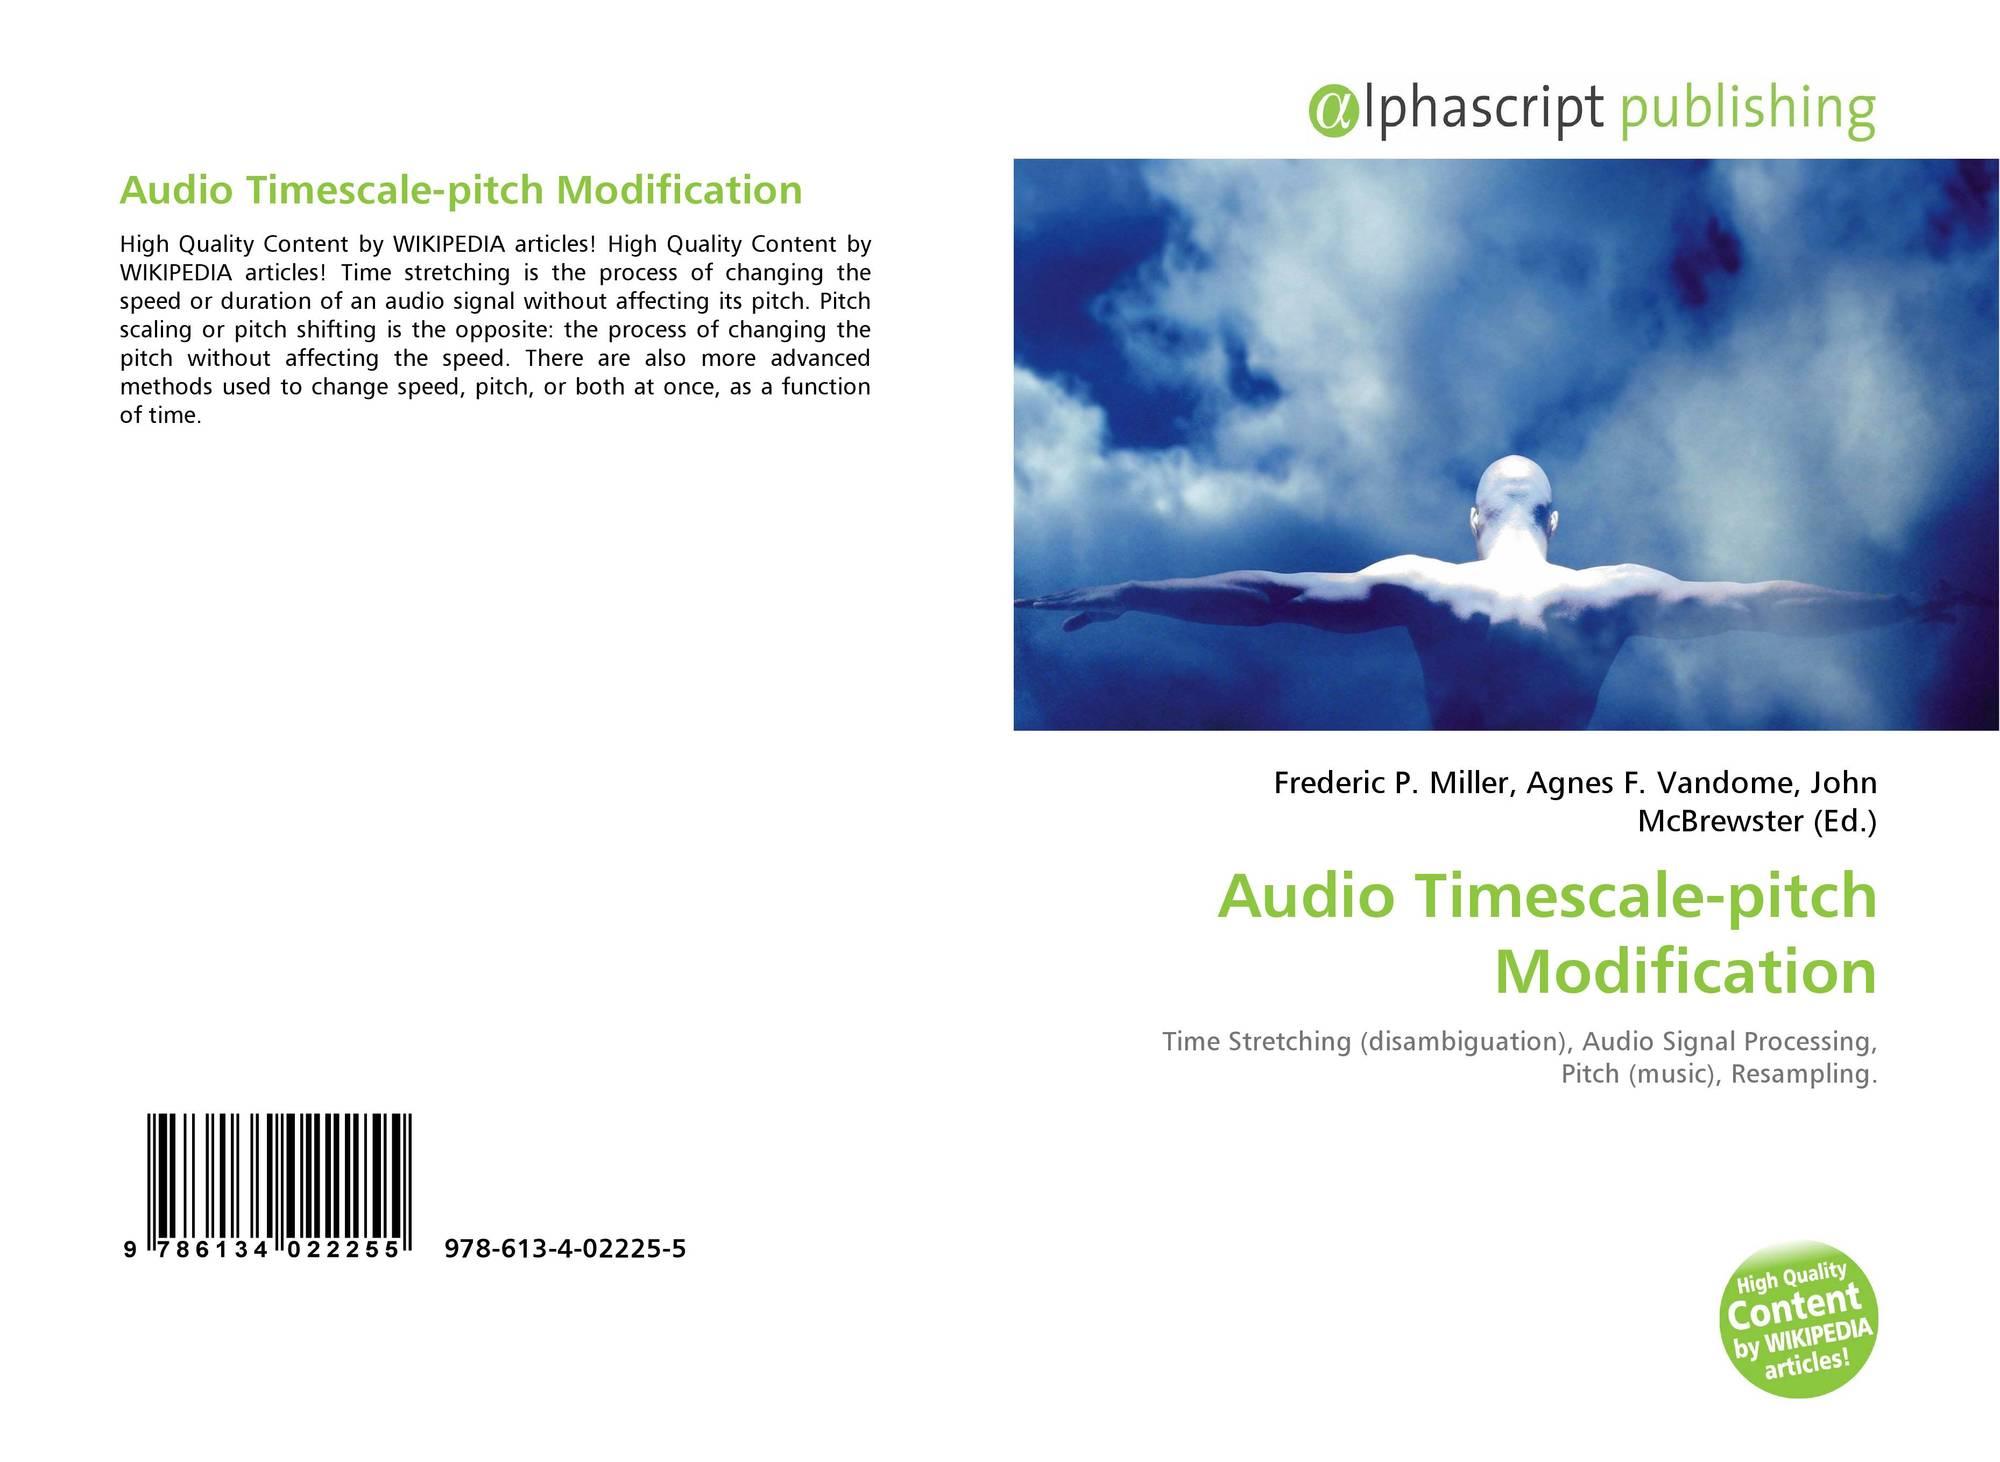 Audio Timescale-pitch Modification, 978-613-4-02225-5